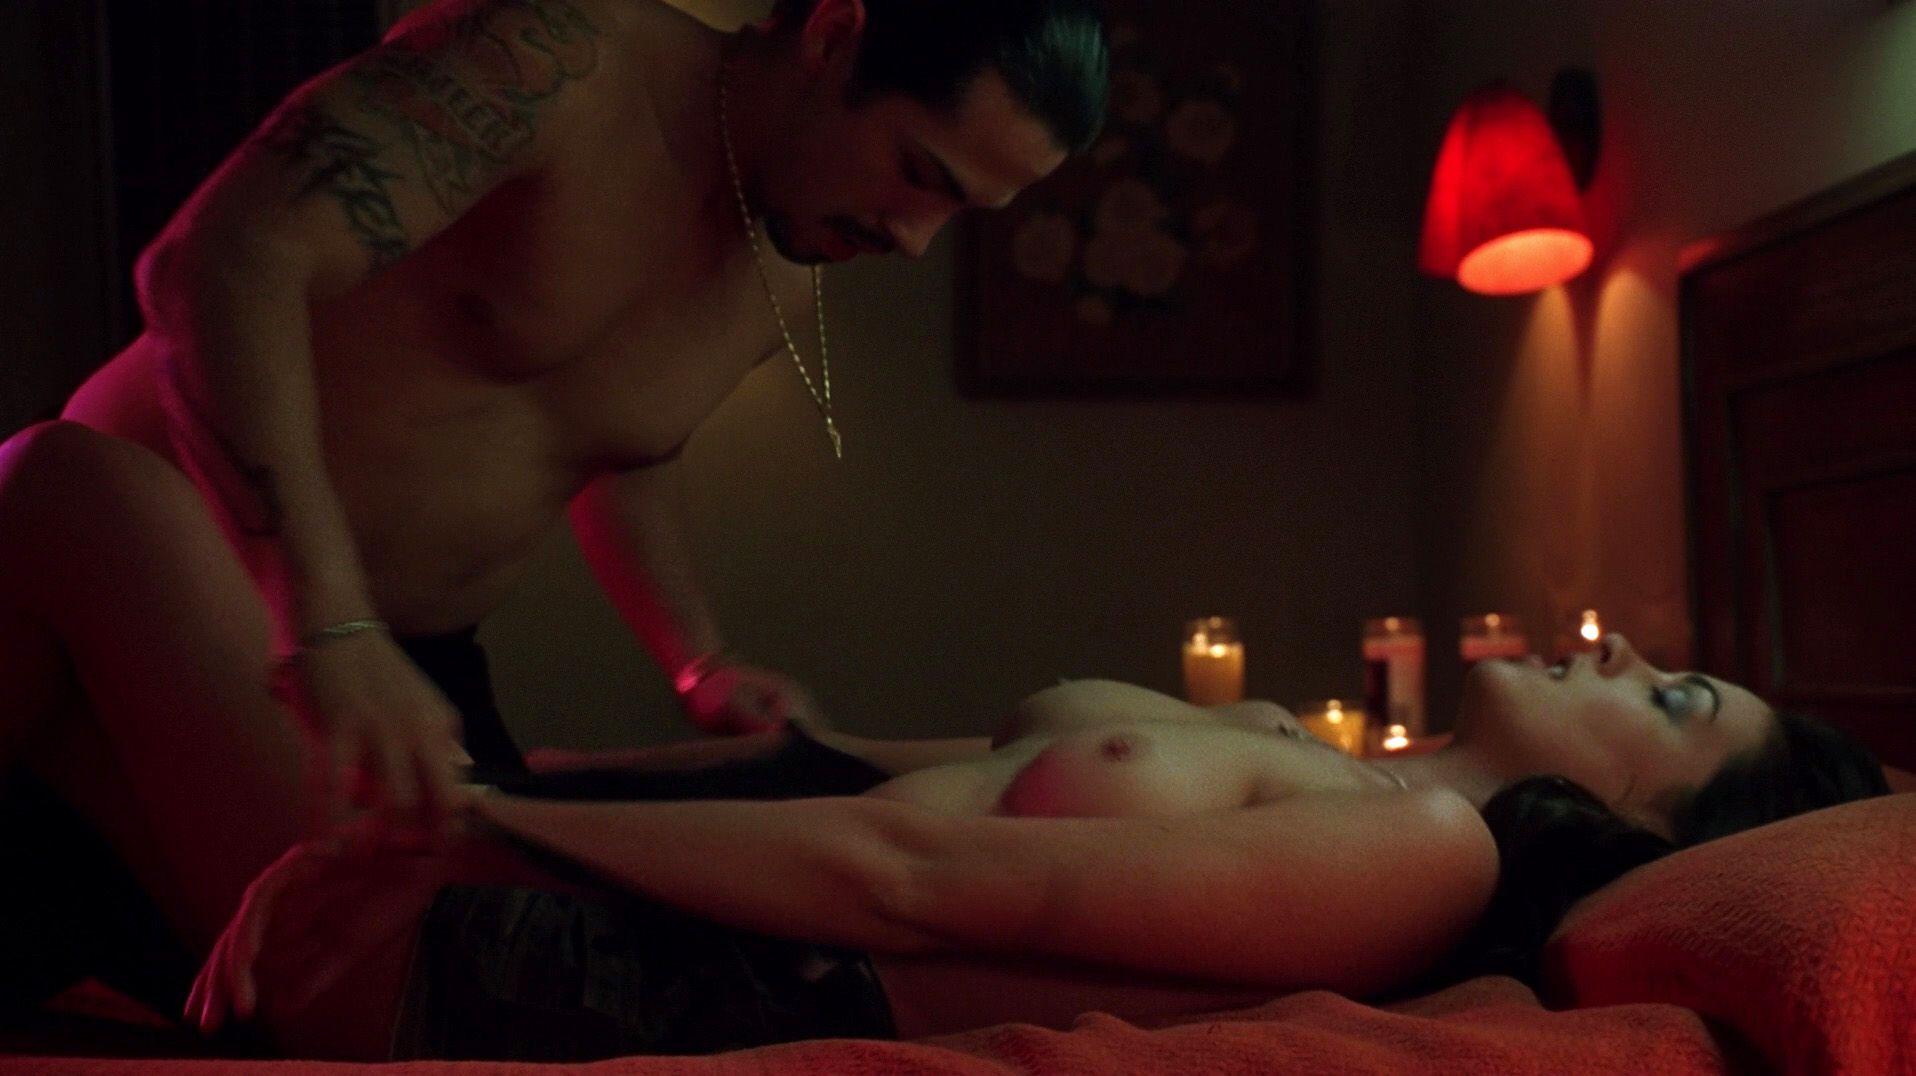 Bijou hathaway sex video